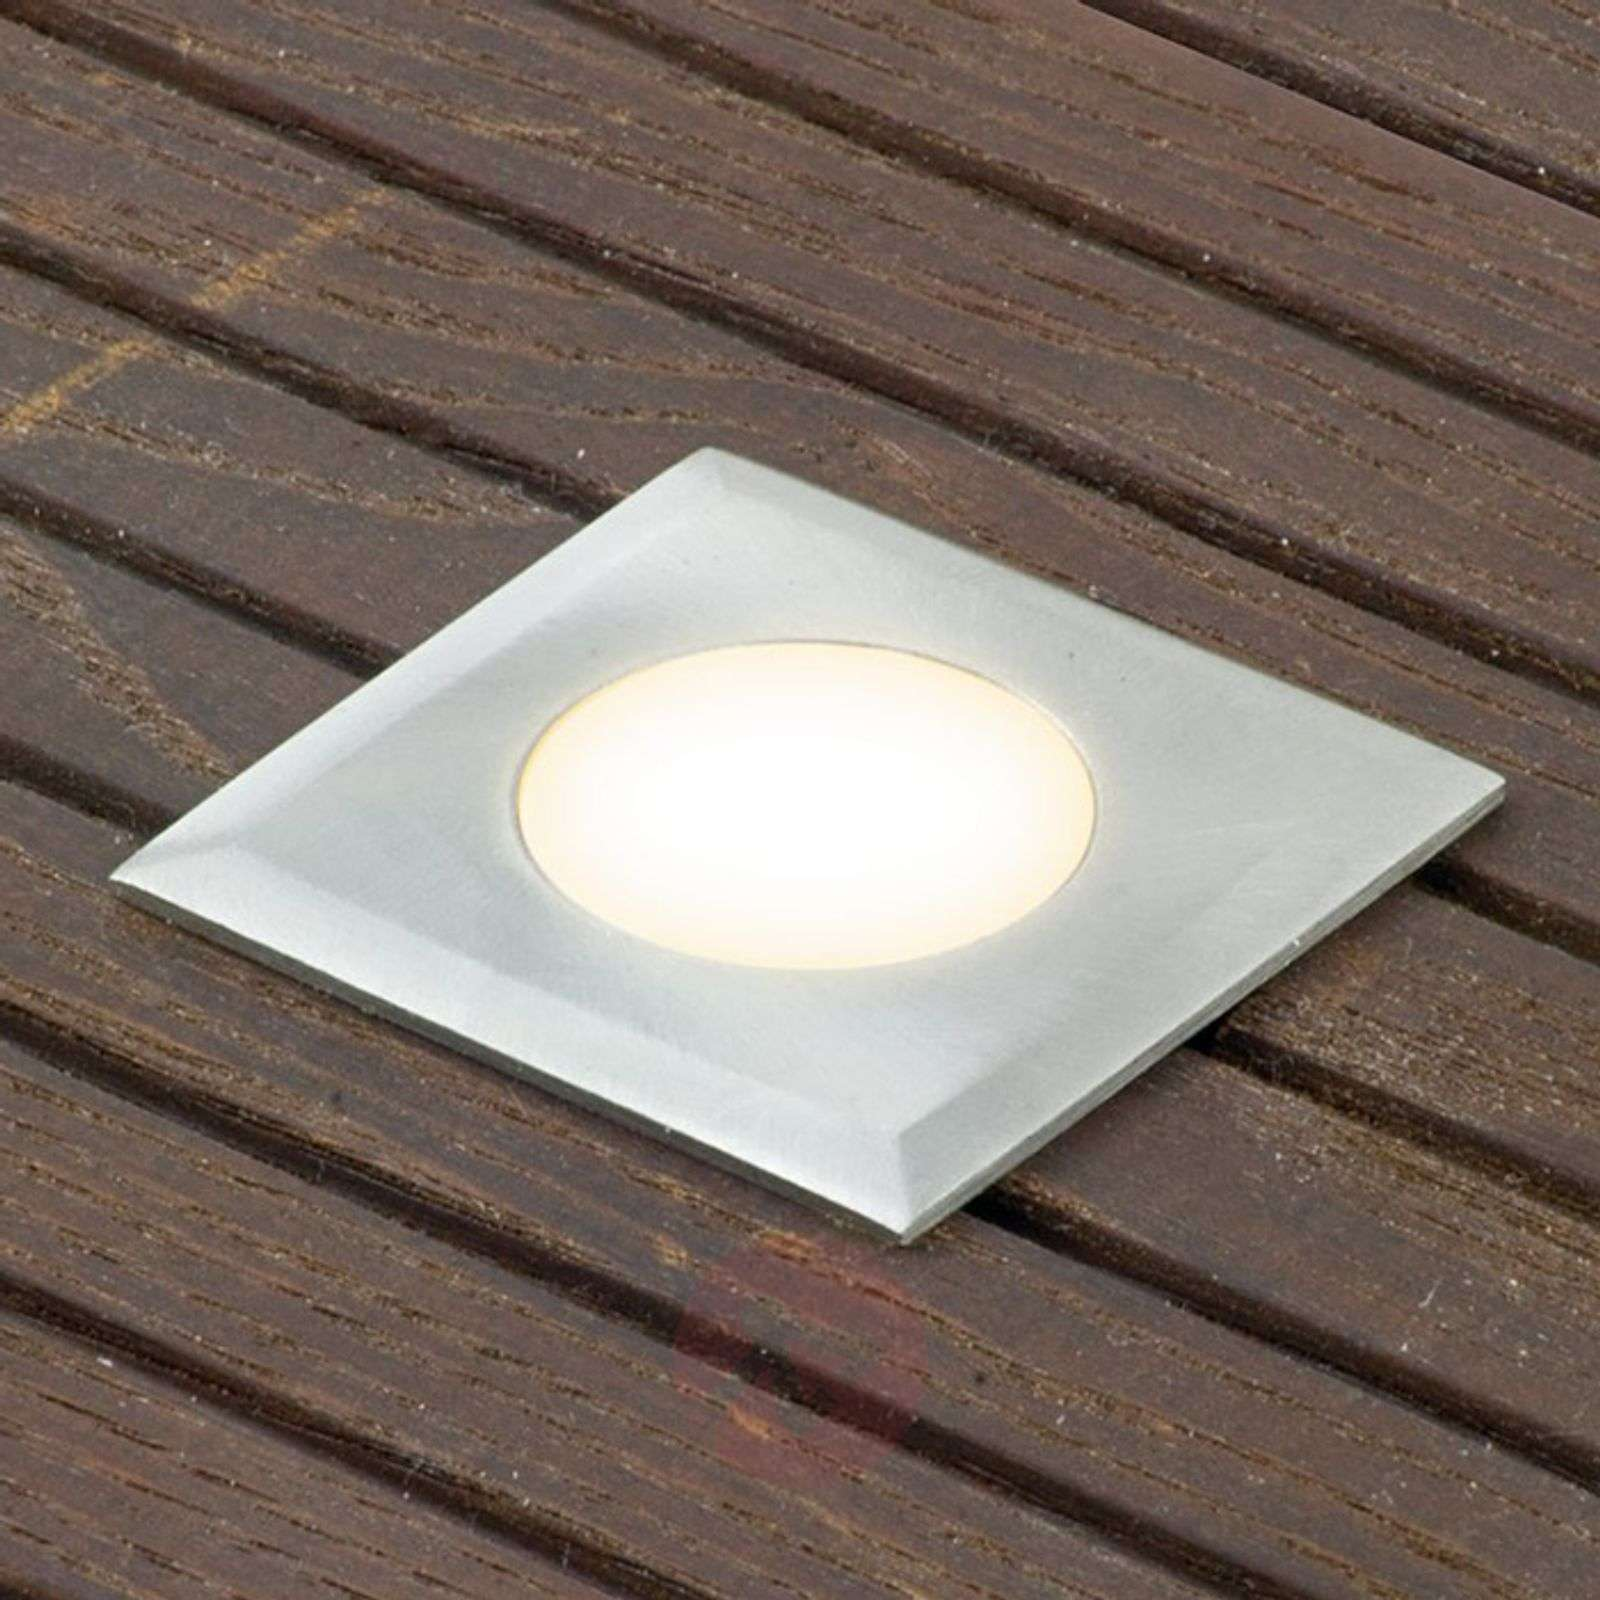 LED-uppospotti Nürnberg III - vaihto-osa